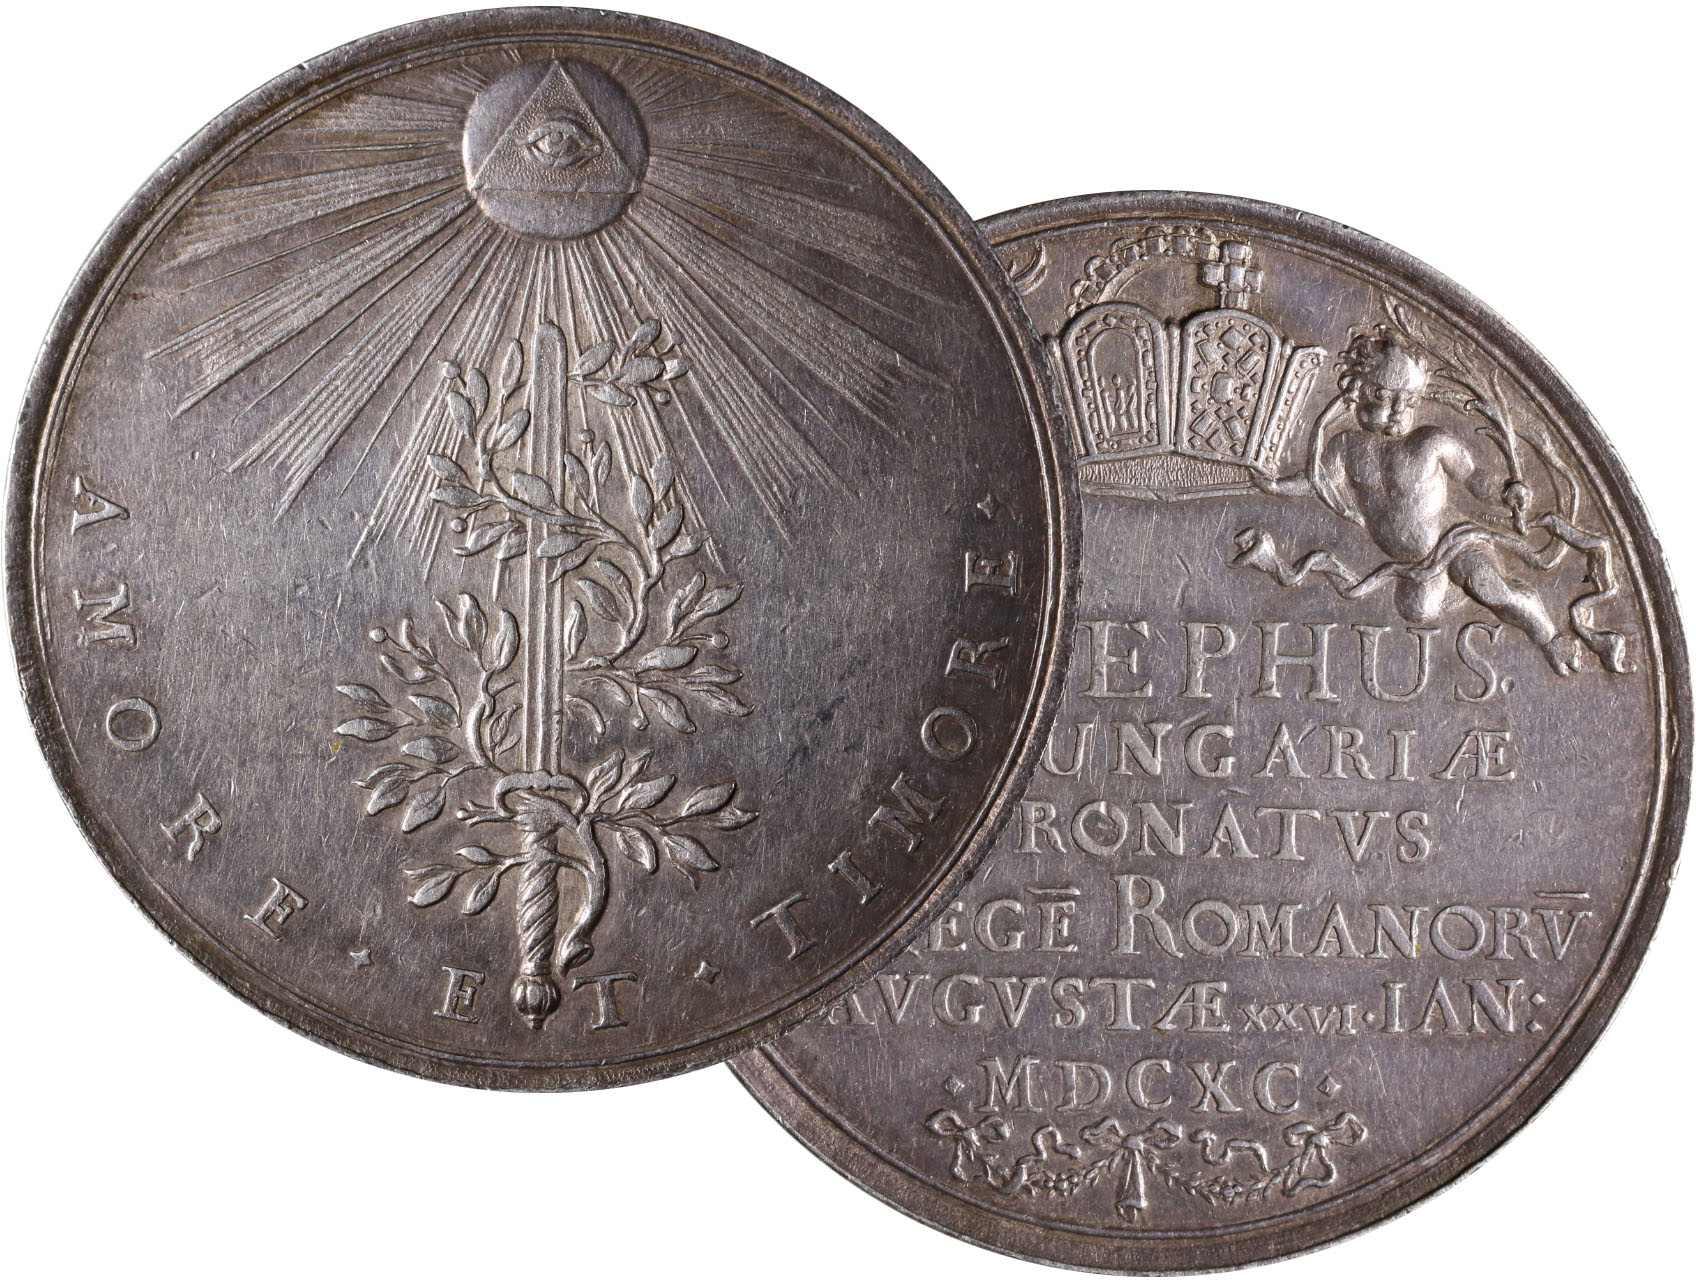 Osobnosti - Josef II. 1780-1790, AR medaile o váze 1 1/2 Tolaru na korunovaci v Ausburku 26.1.1690, 39,12g